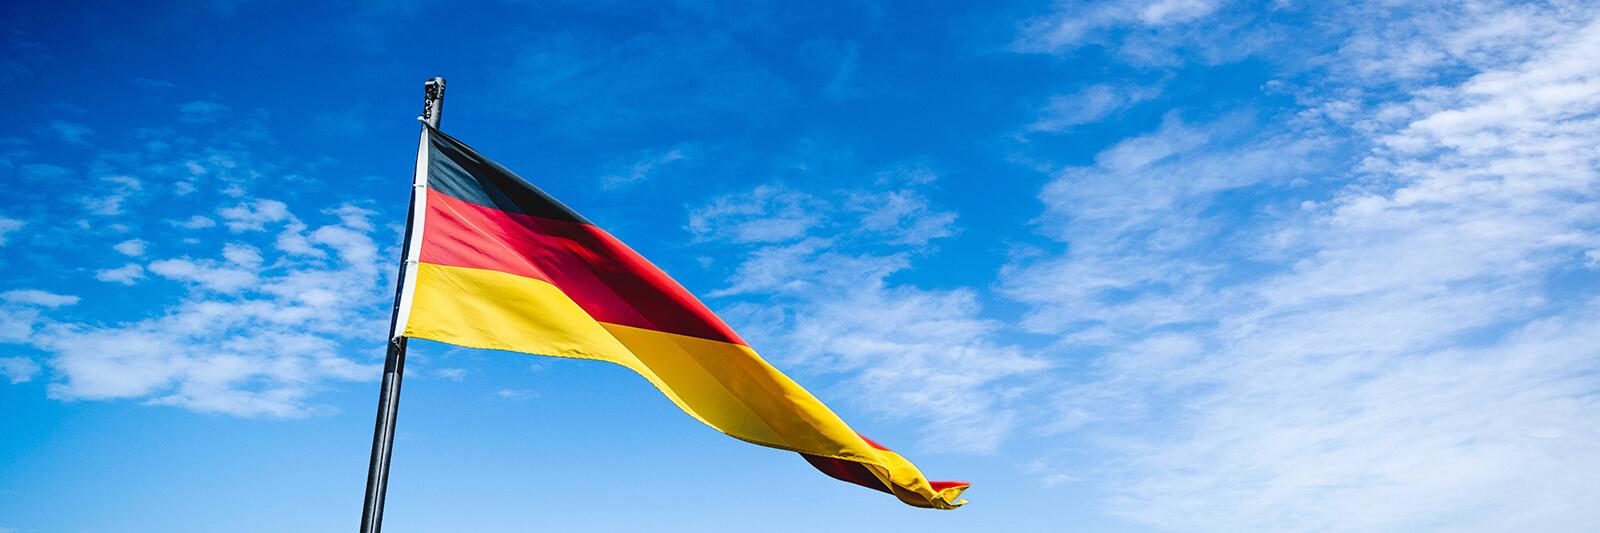 German flag flying high over the blue skies of Berlin